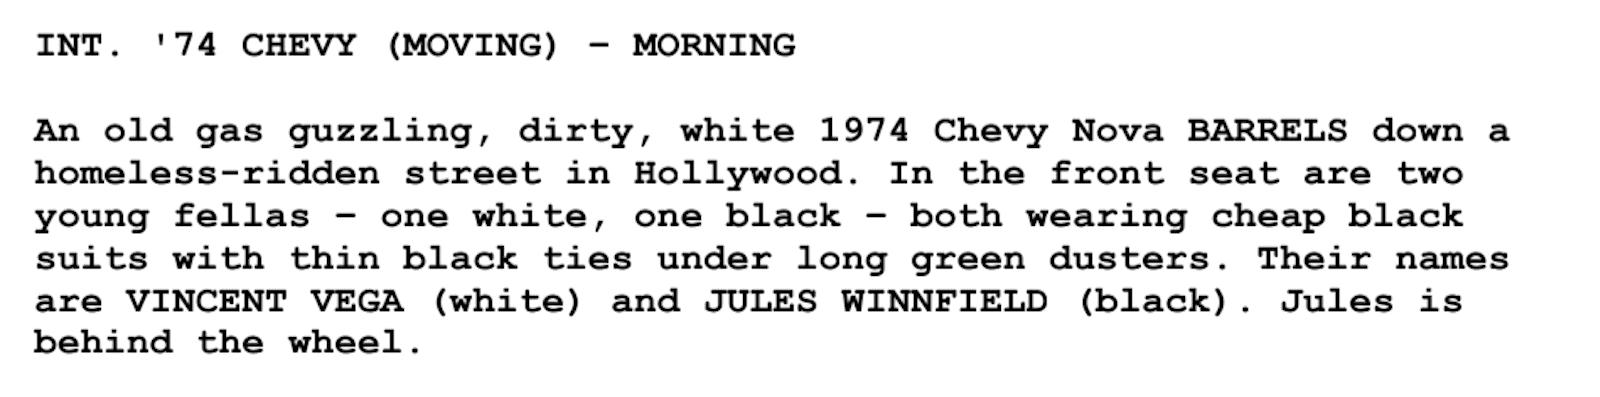 Screenplay Examples - Pulp Fiction Script - Screenplay Snippet 16 - Chevy Nova